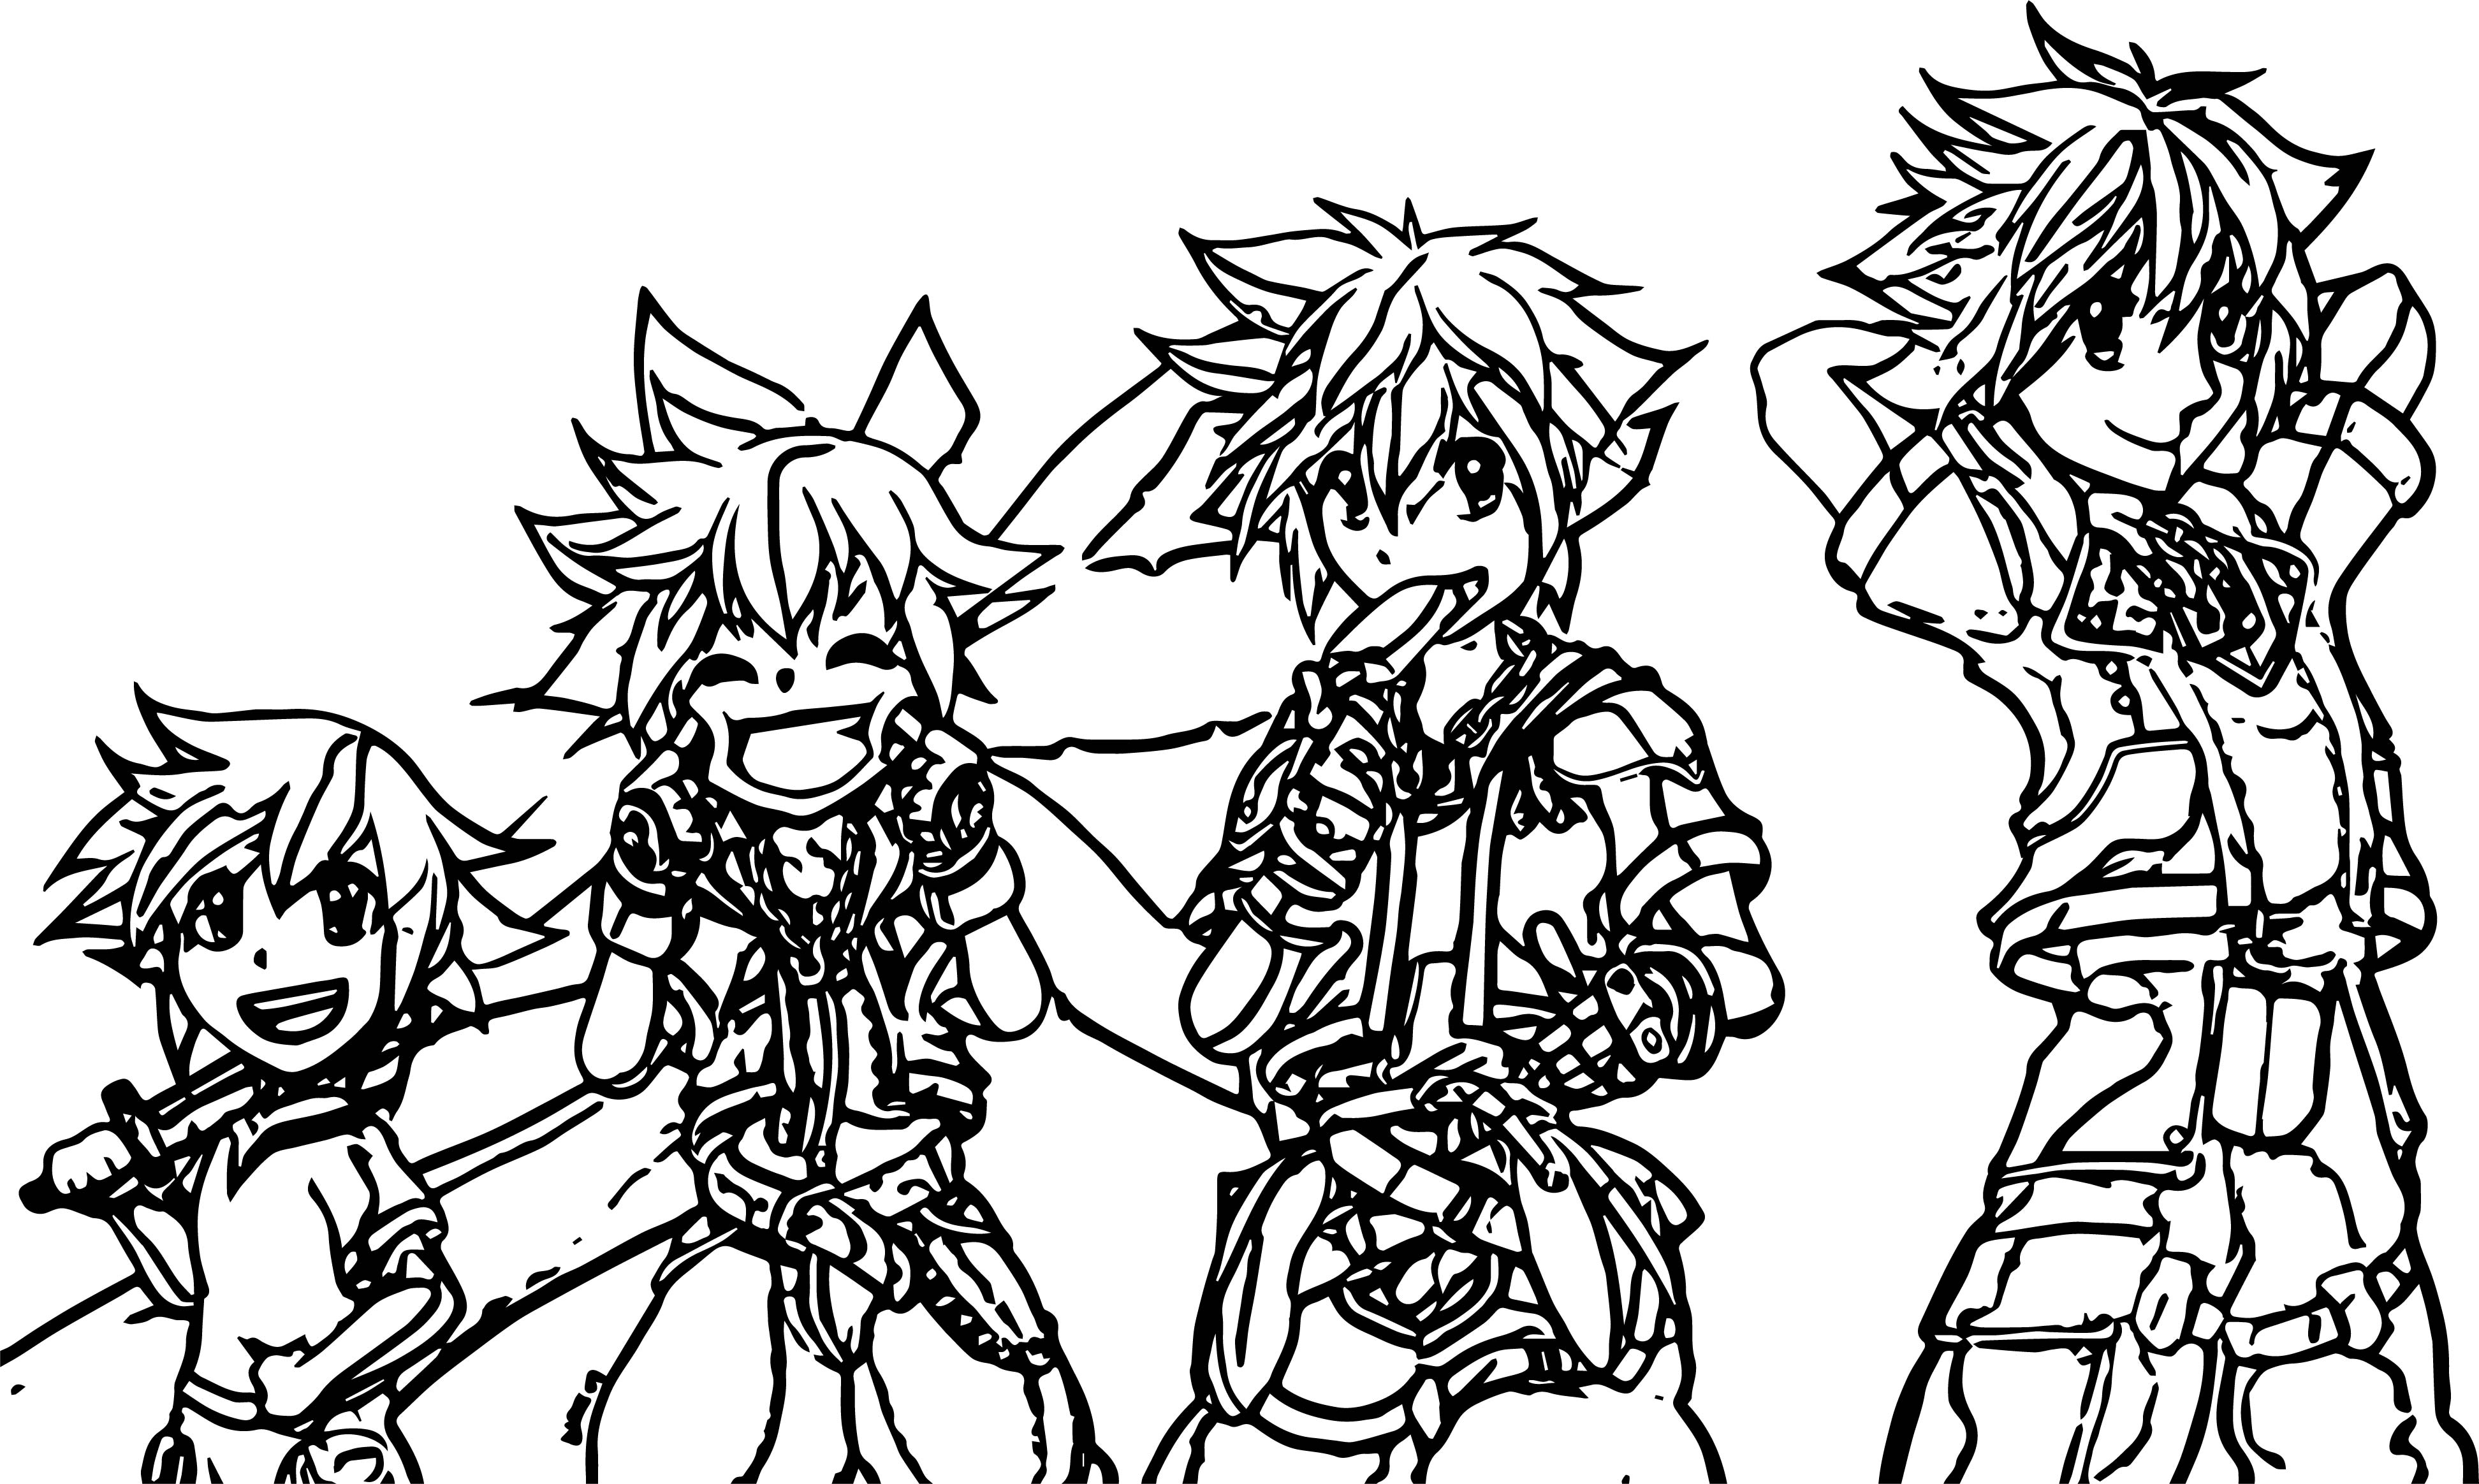 Sora Grown Up Col Suzuran Coloring Page